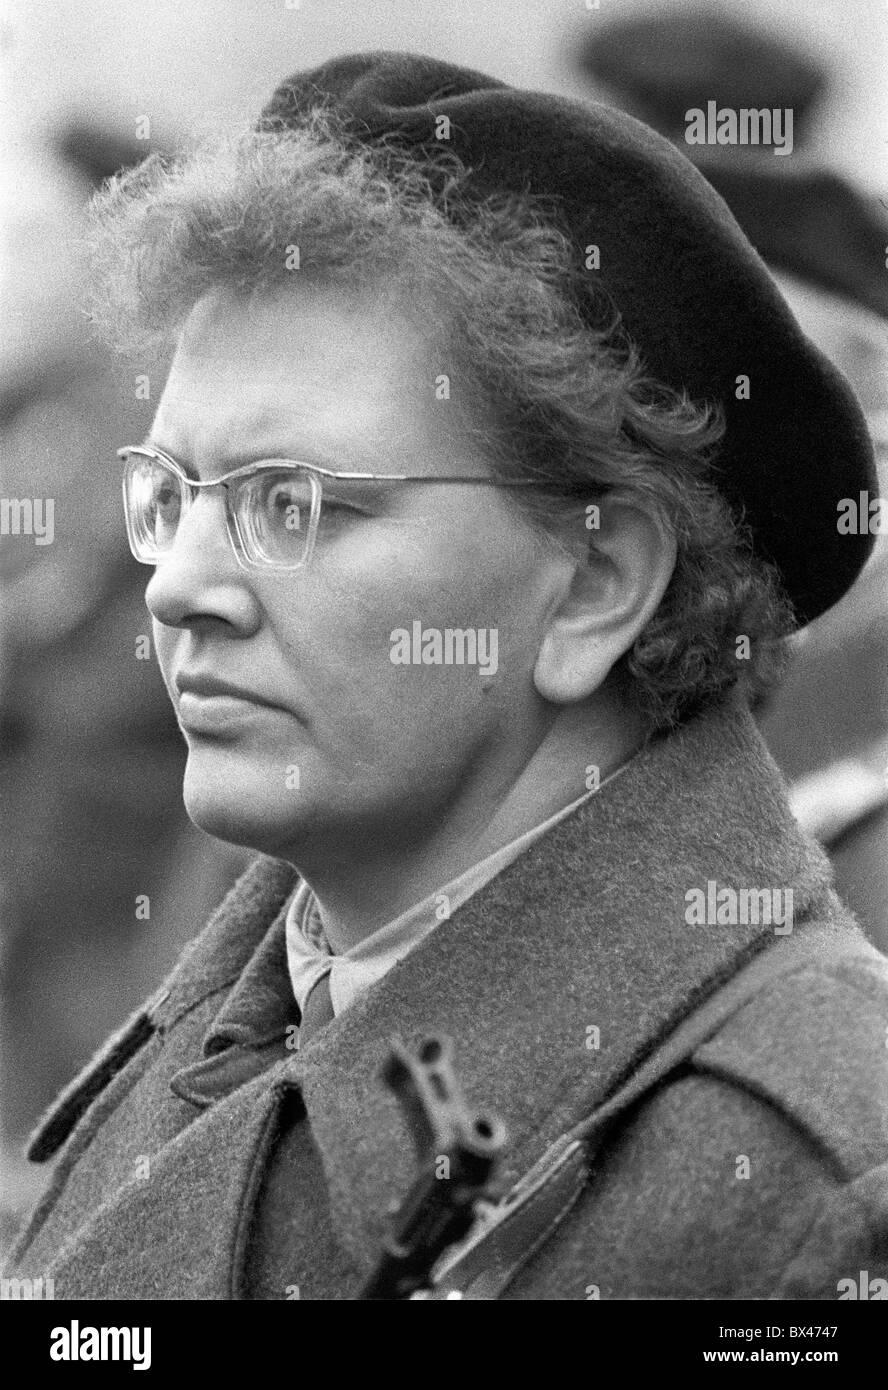 People´s Militia, submachine gun, woman - Stock Image